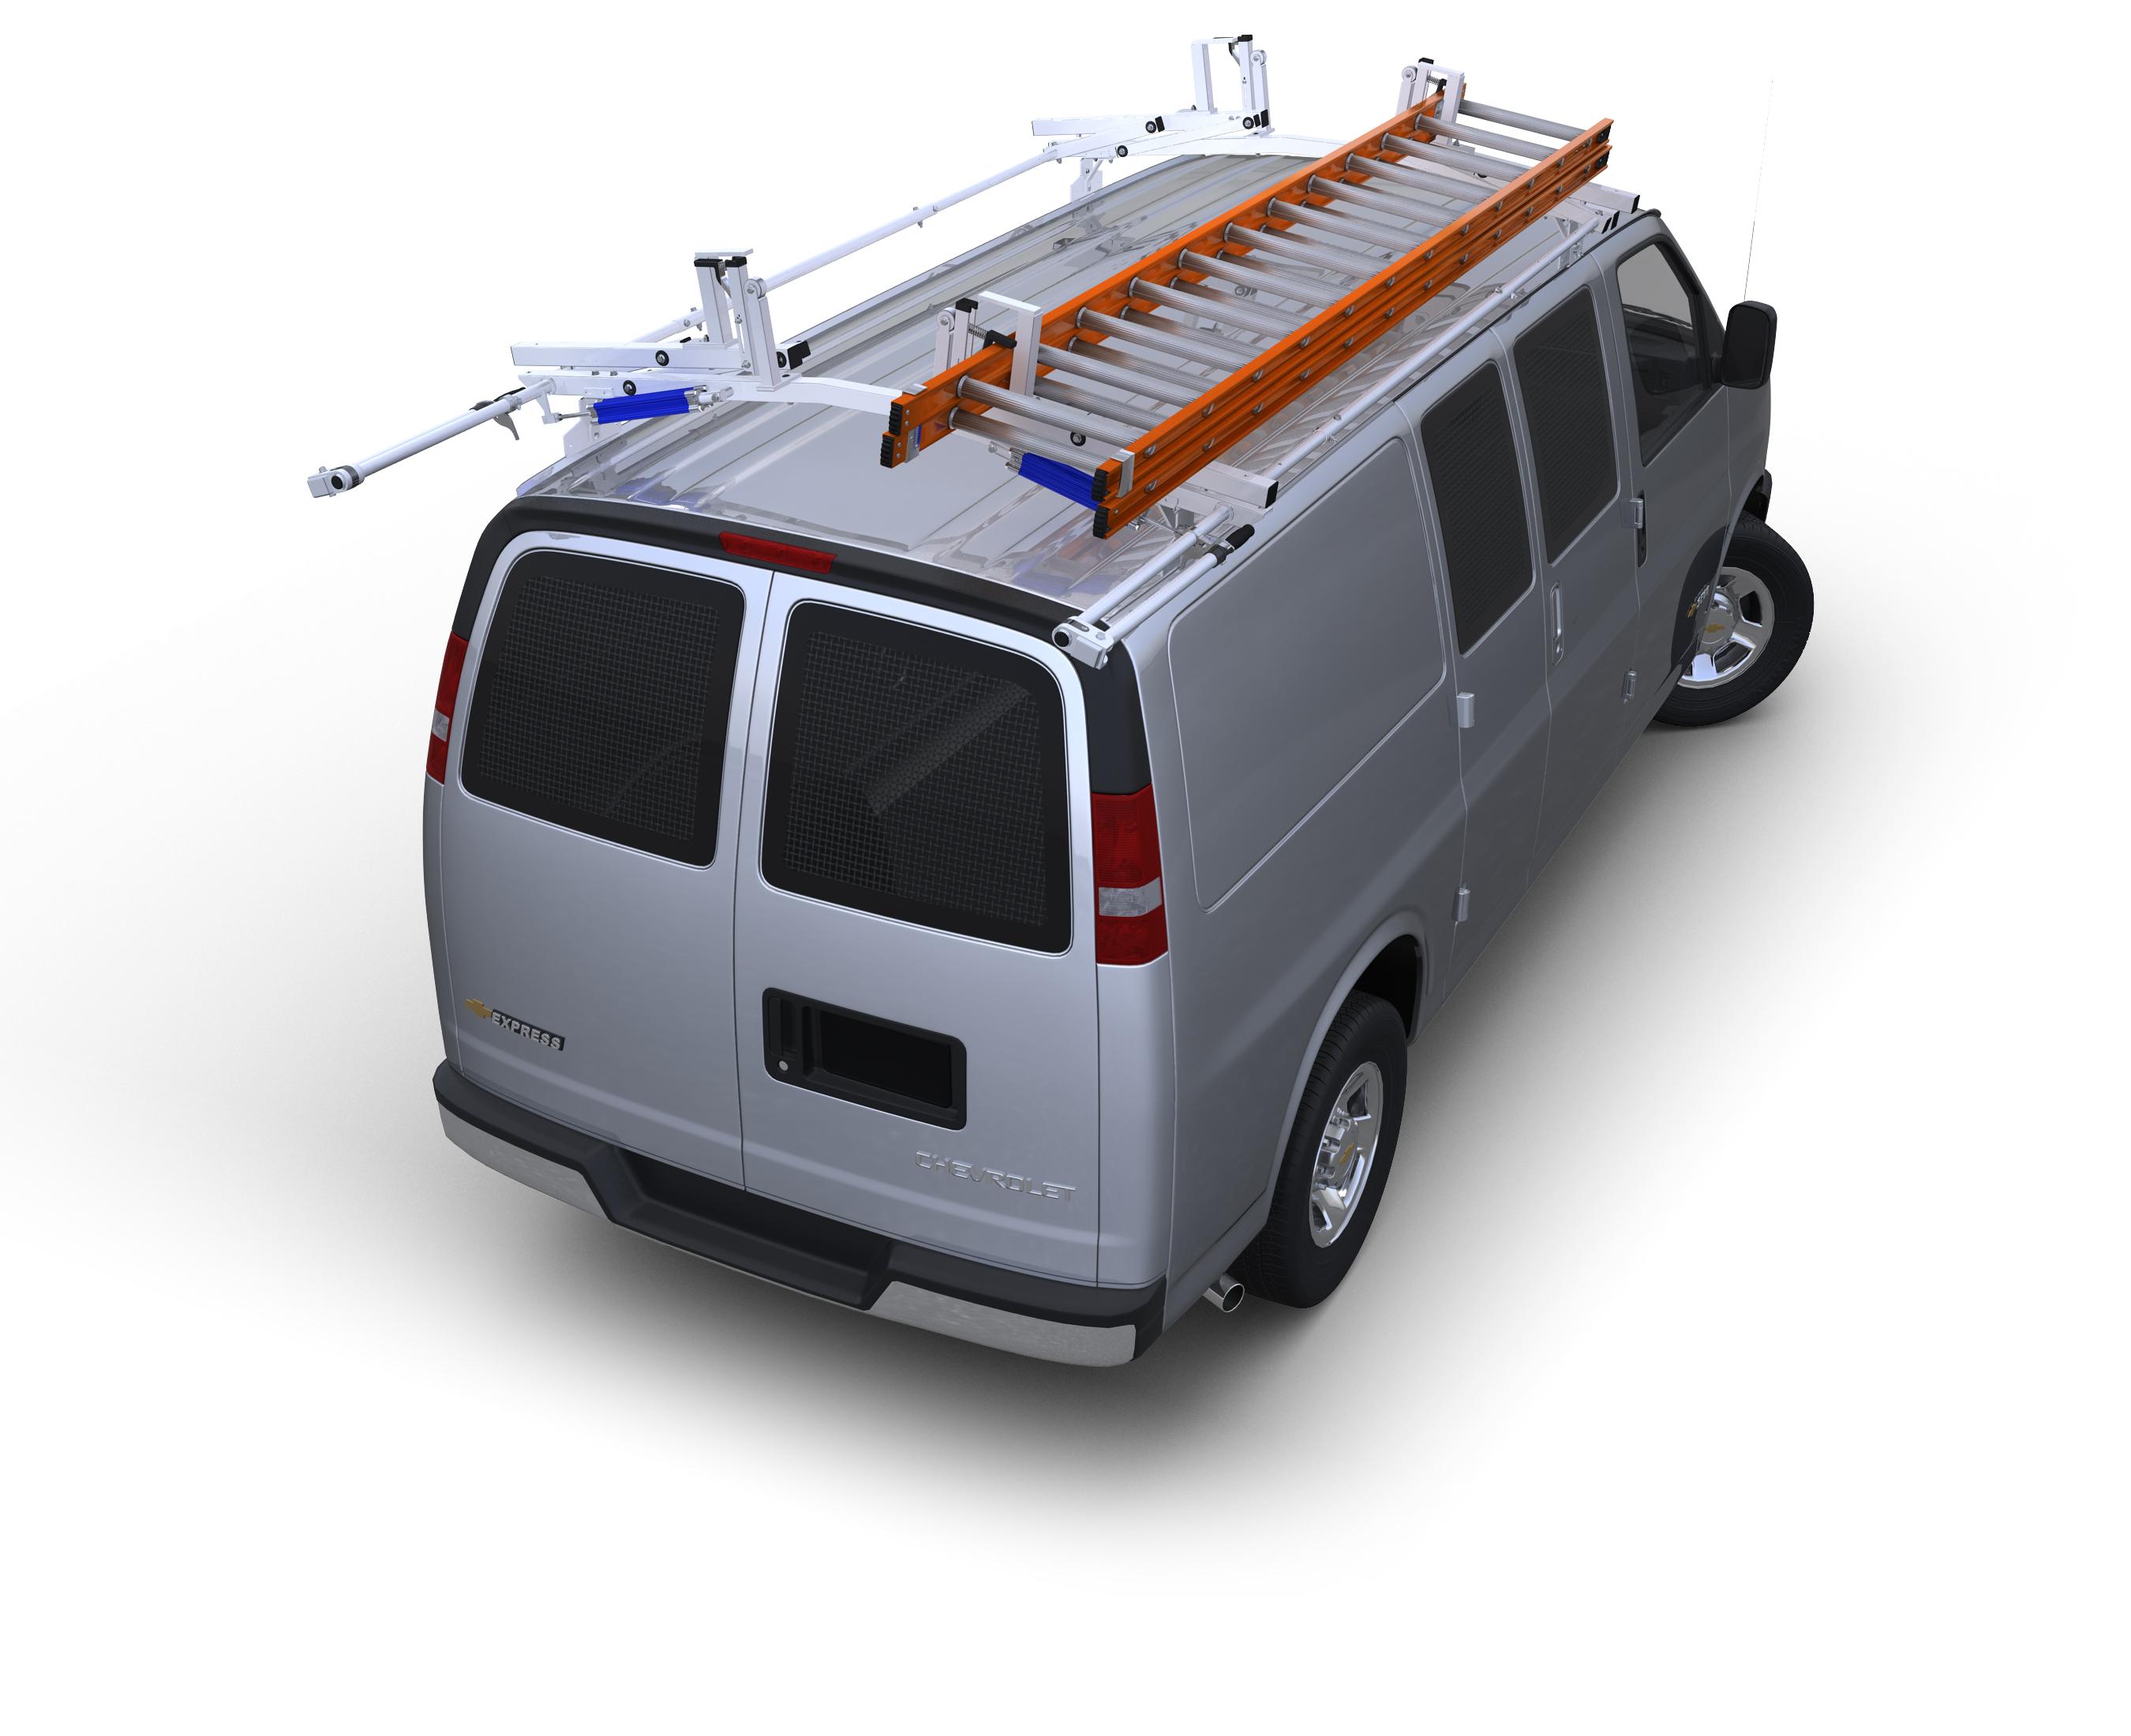 Topper Hot Dip Galvanized 10u0027 Cargo Carrier Rack For The Nissan NV High Roof  Van